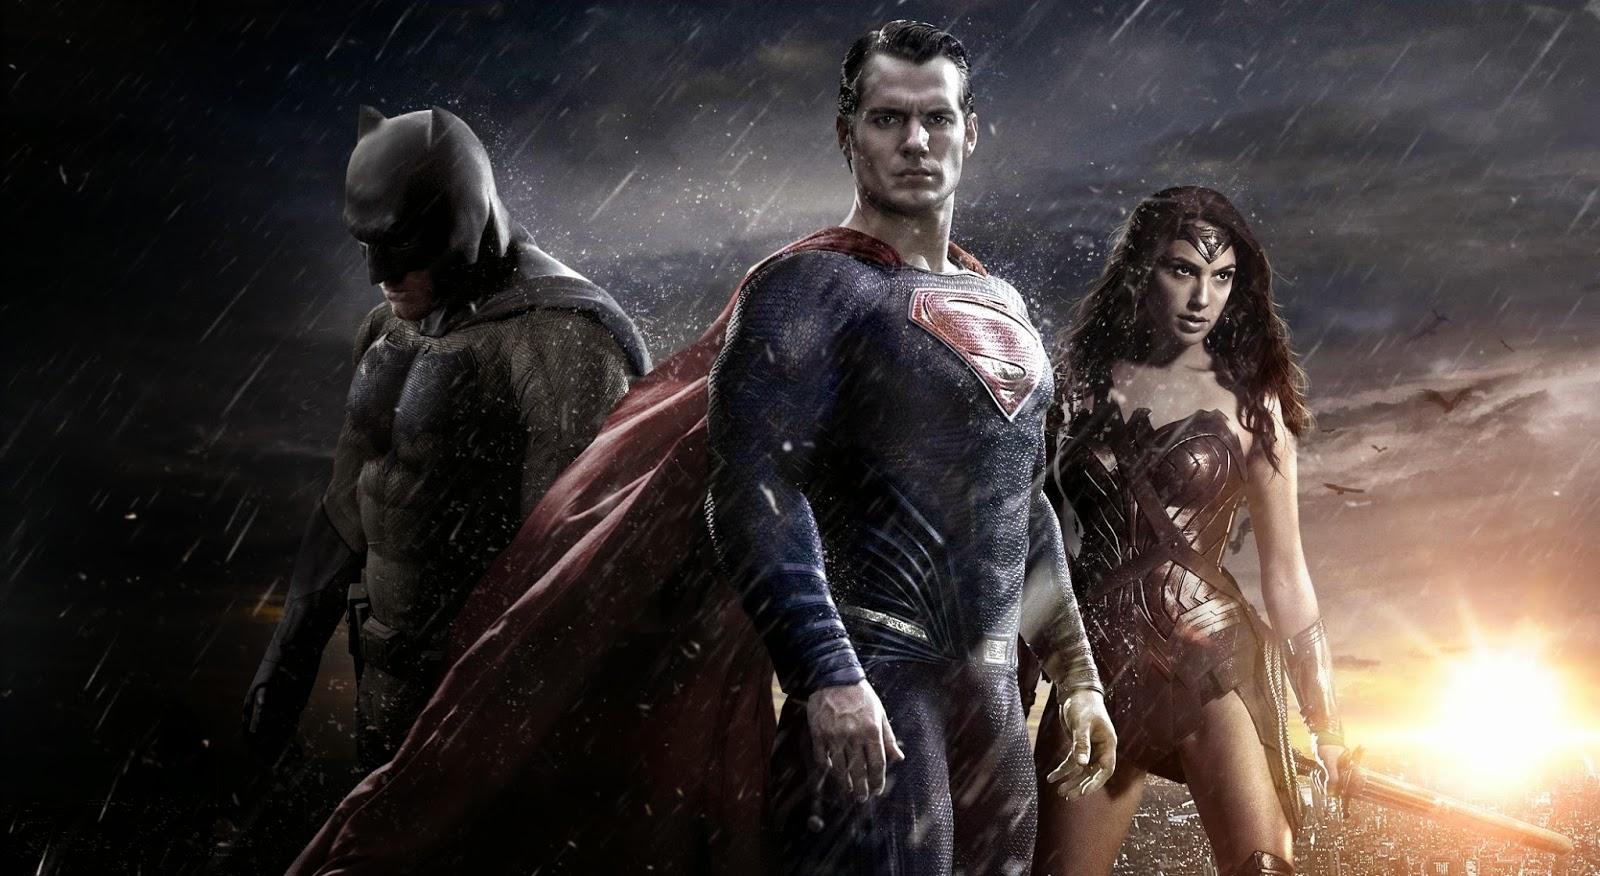 Superman Man of Steel 2 | Teaser Trailer